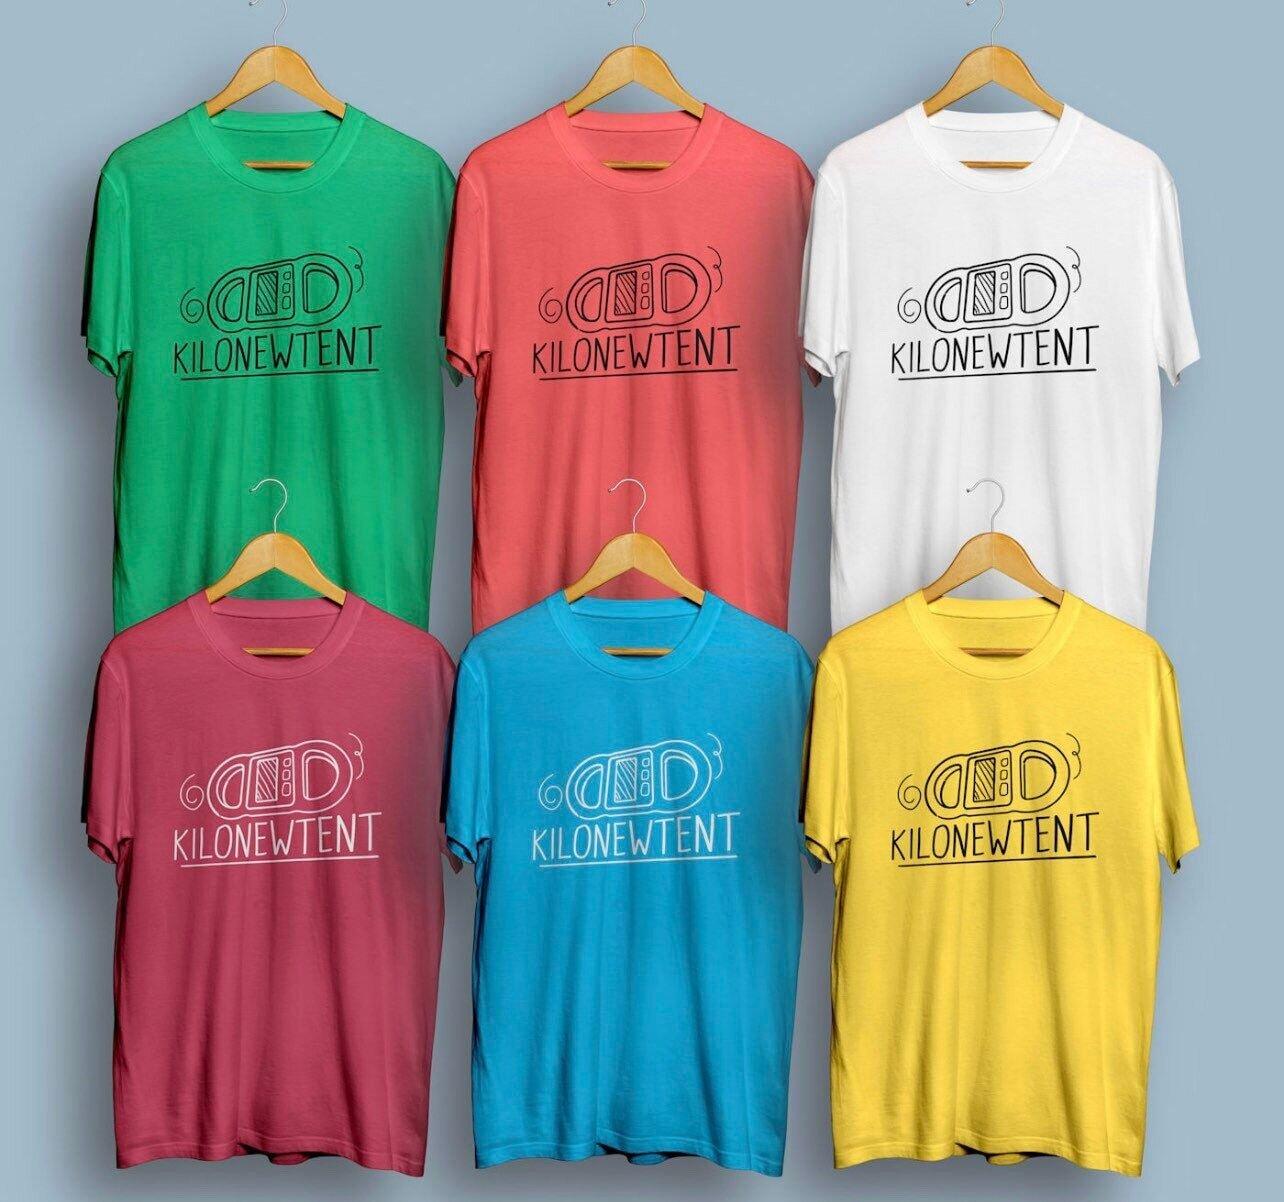 HowNot2Highline Official Ryan Jenks Kilonewtent Kilonewton  Shirt! Super Good Enough